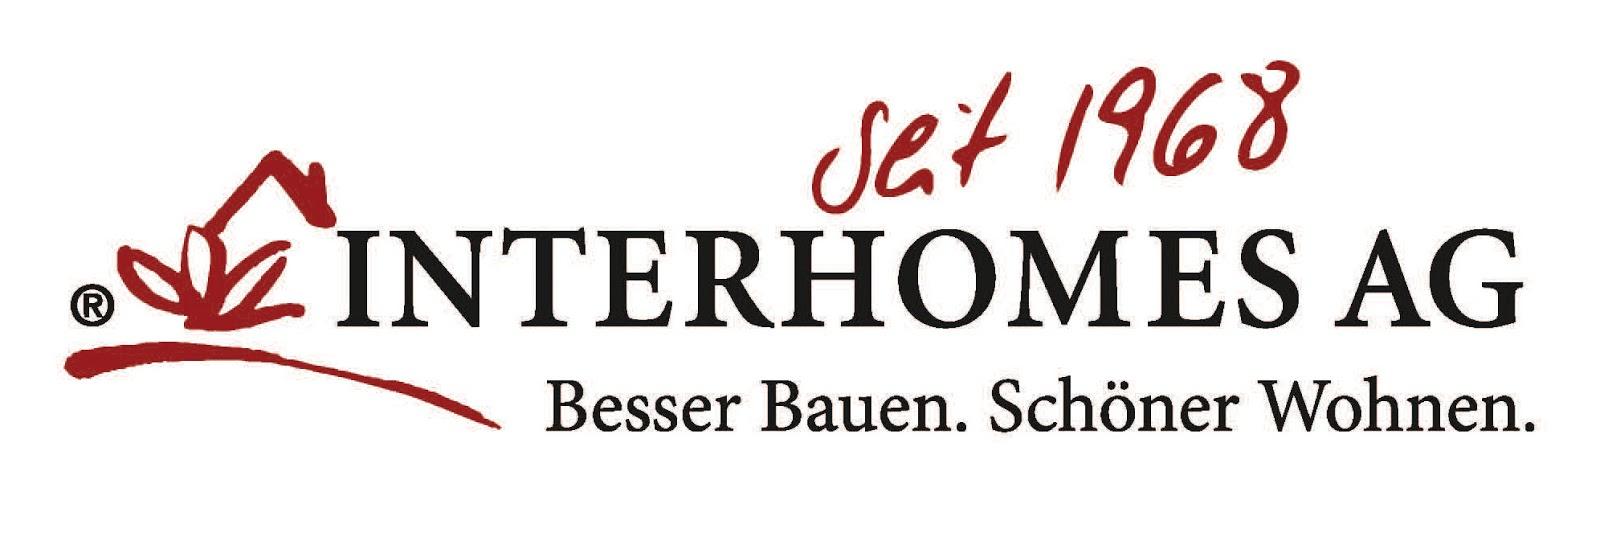 Teil 1: Münchner Immobilien Messe 2013: Die Interhomes AG